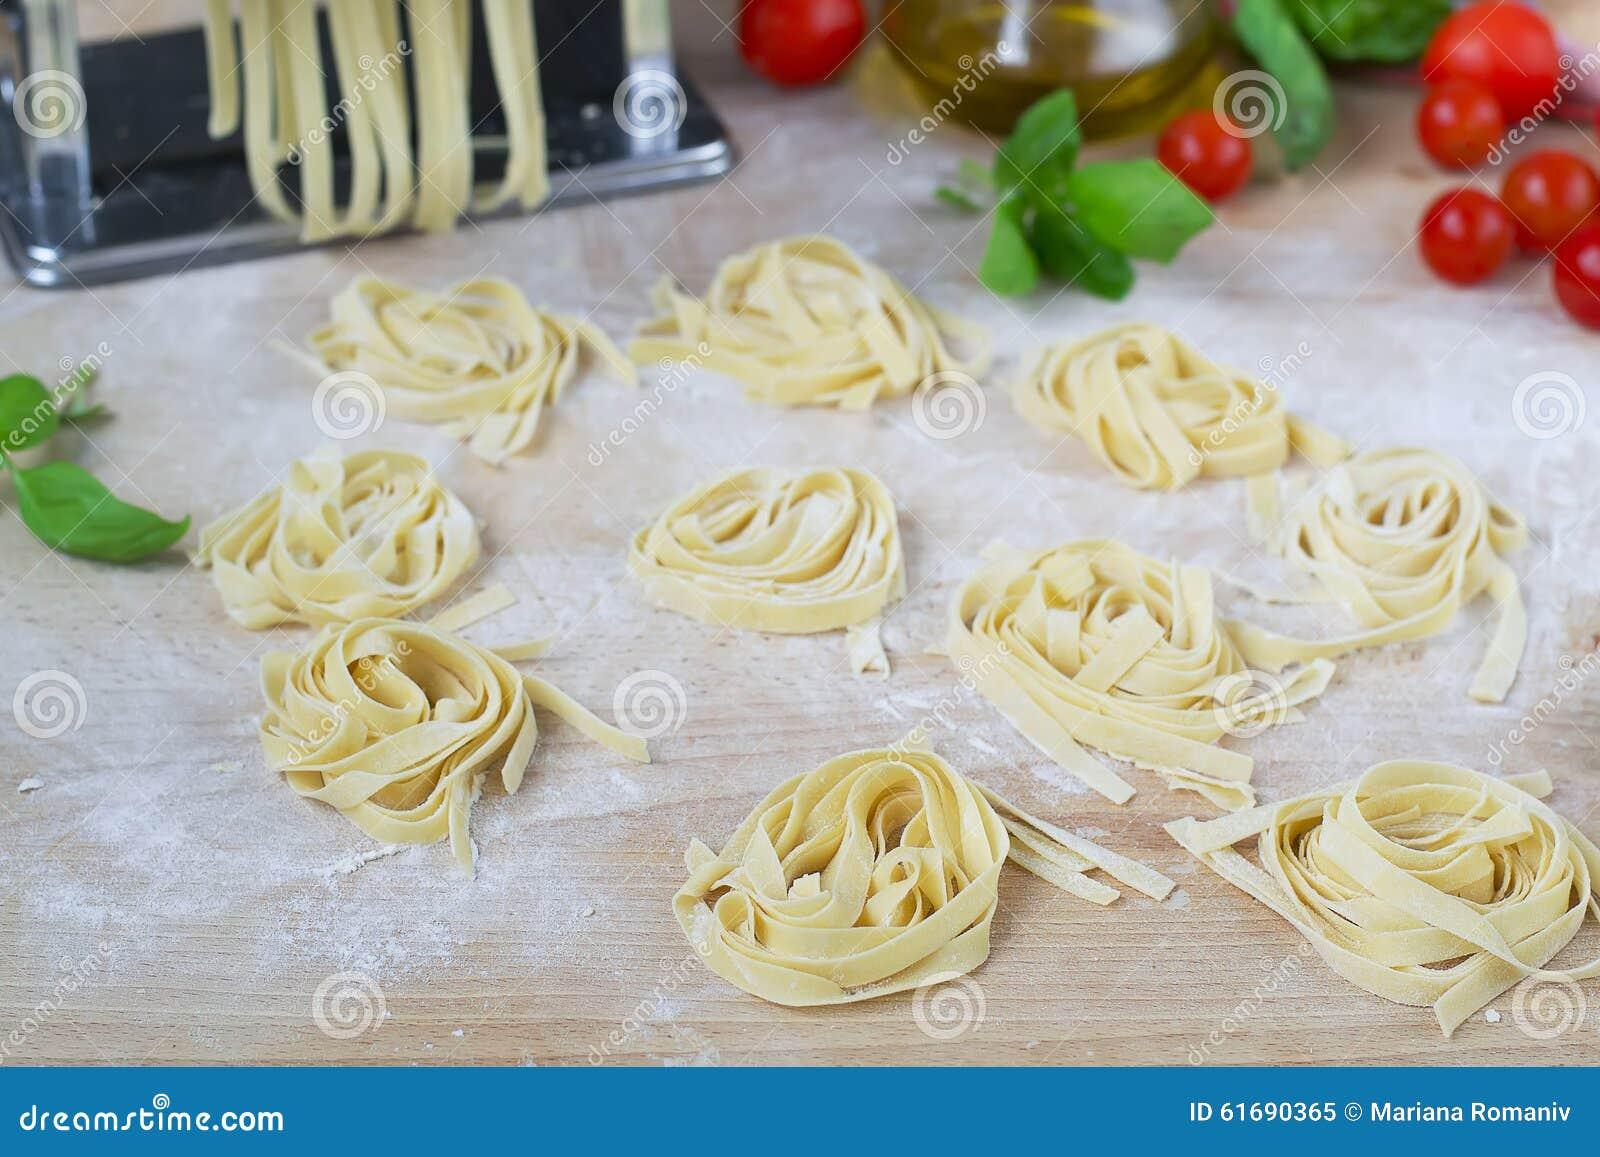 how to make fresh pasta with a pasta machine